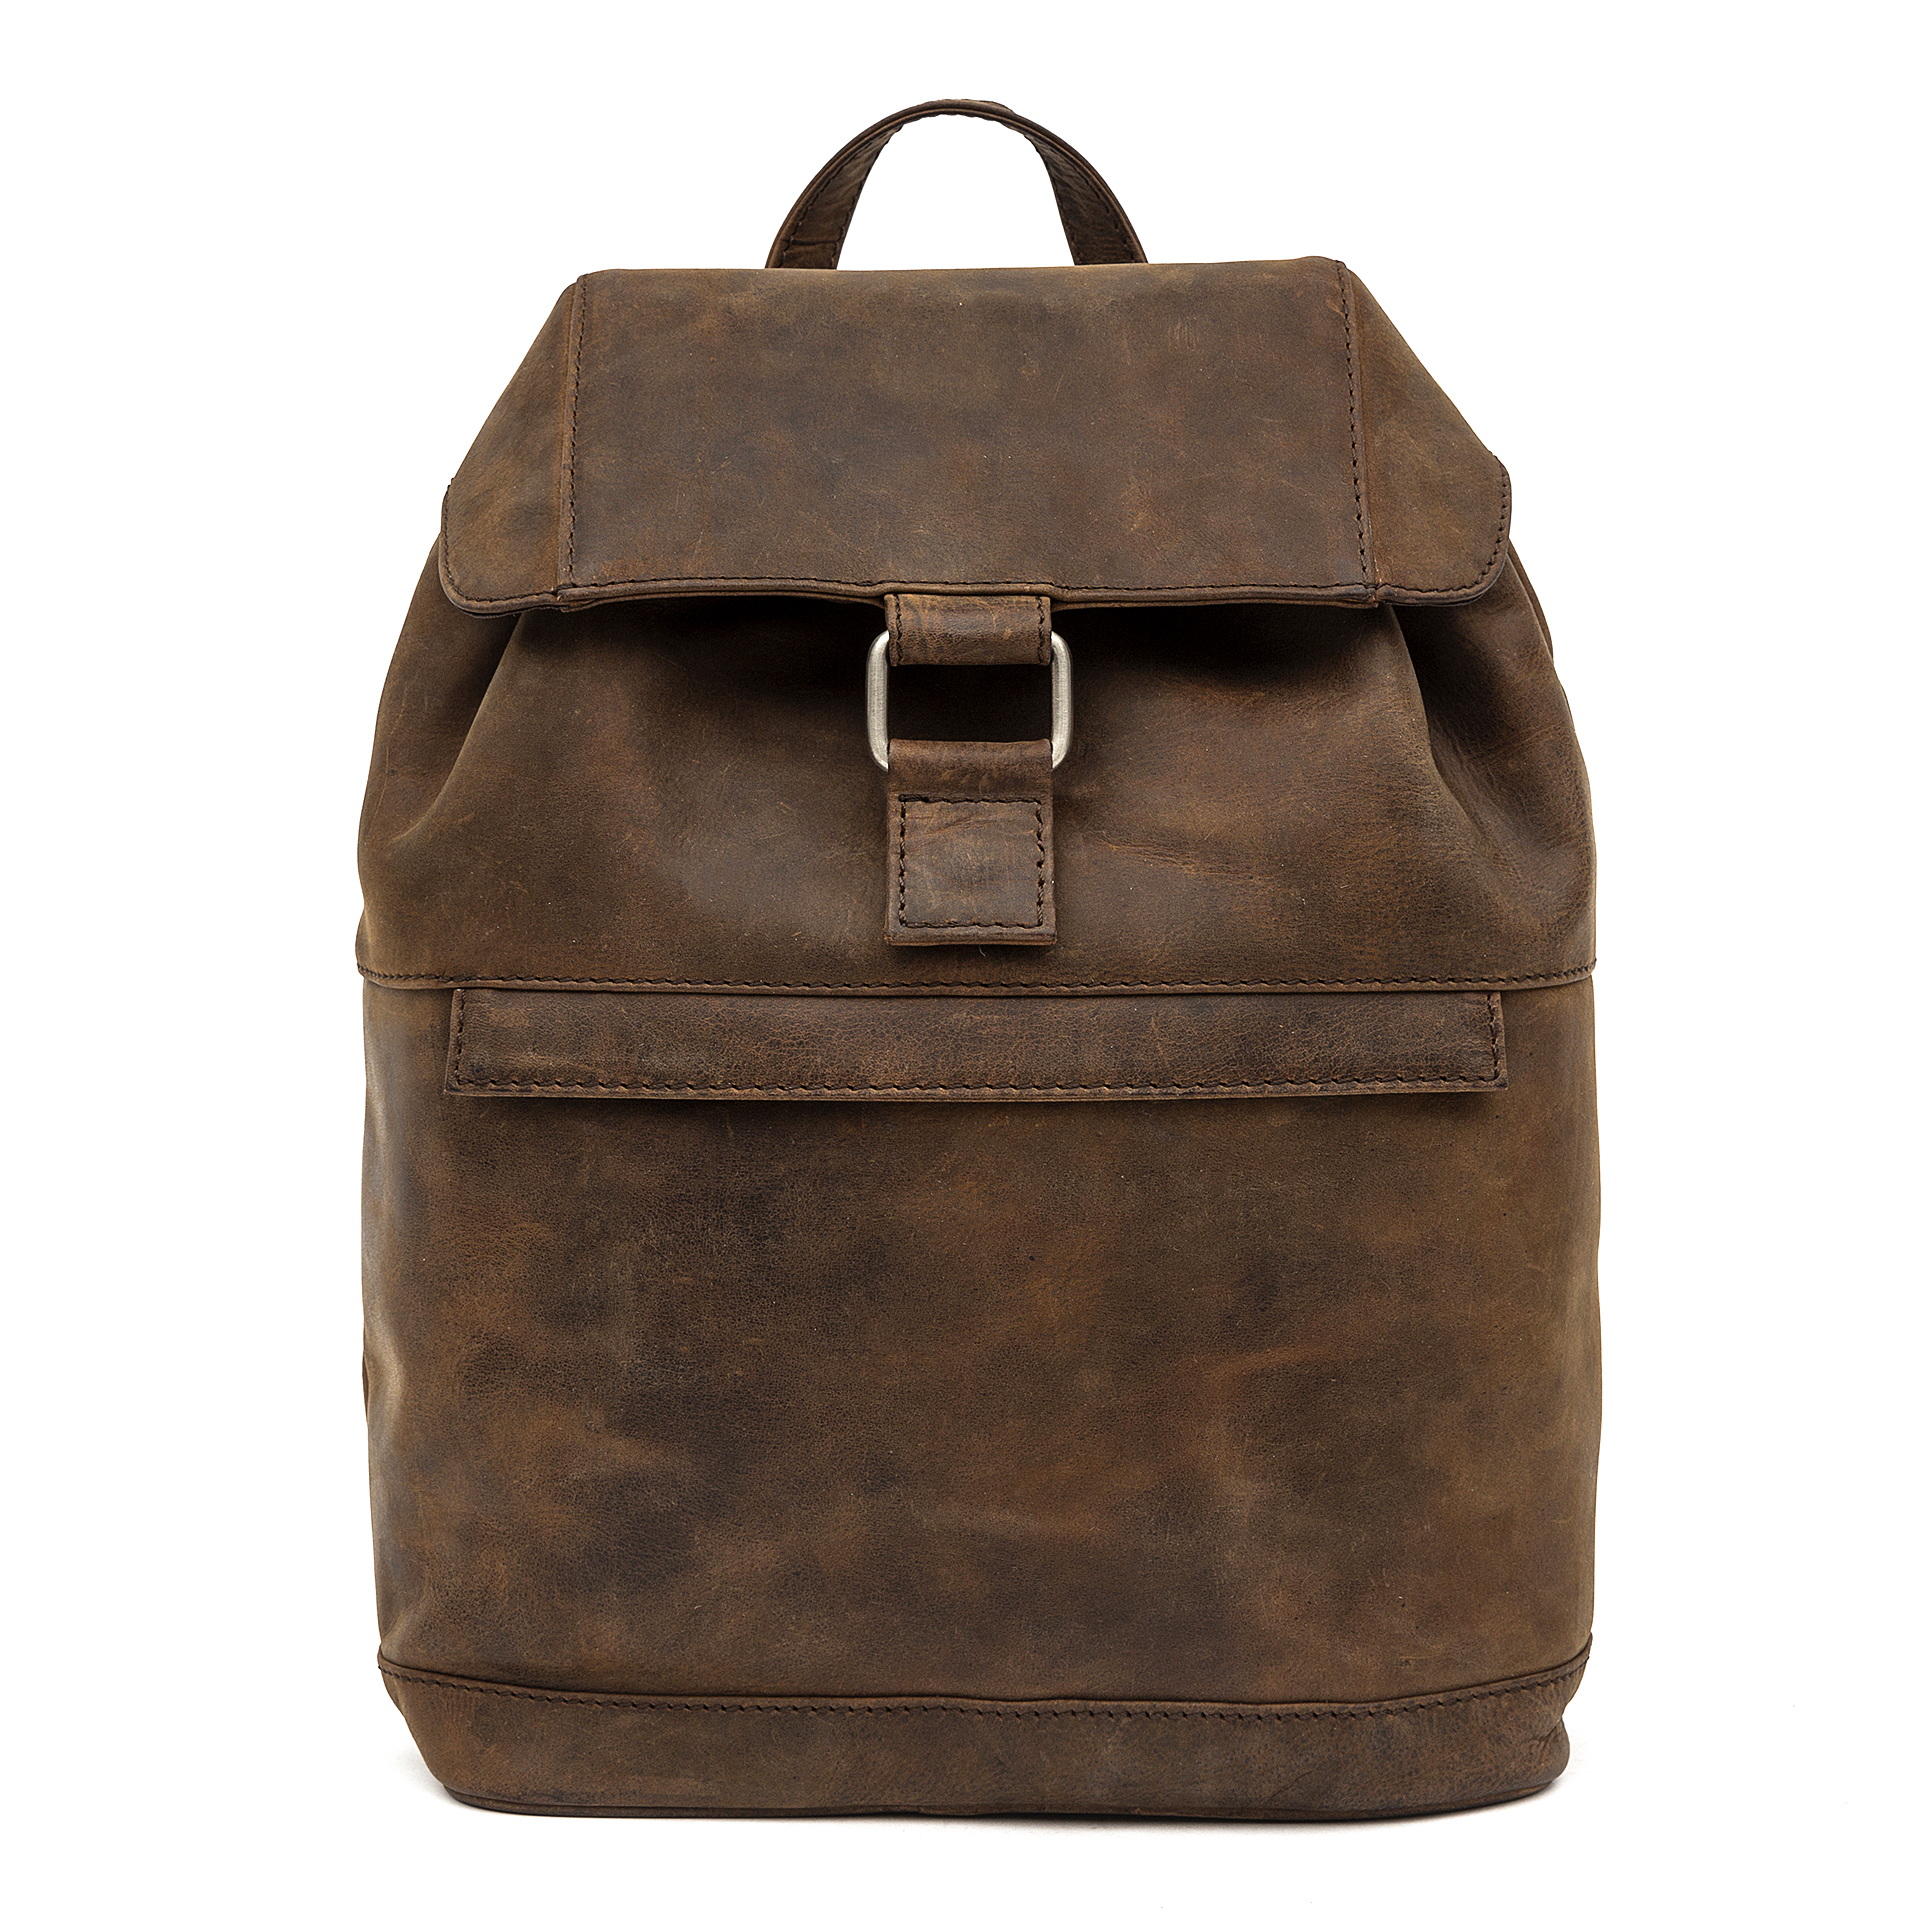 3971e5c7c61e29 leather backpack by Porterbello's Sorrento rucksack brown vintage